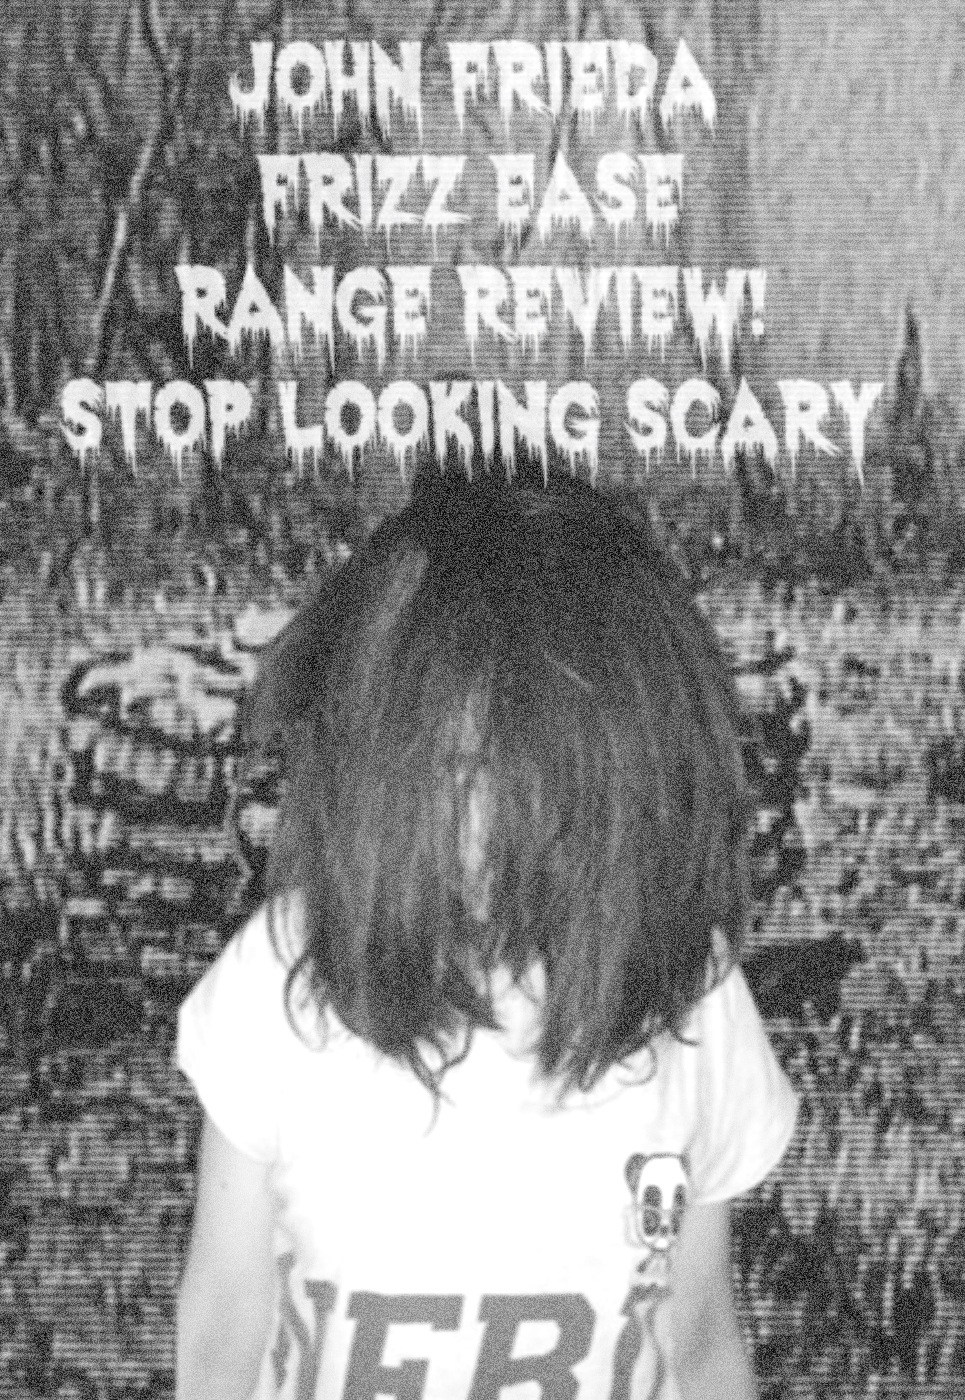 John Frieda frizz ease hair review